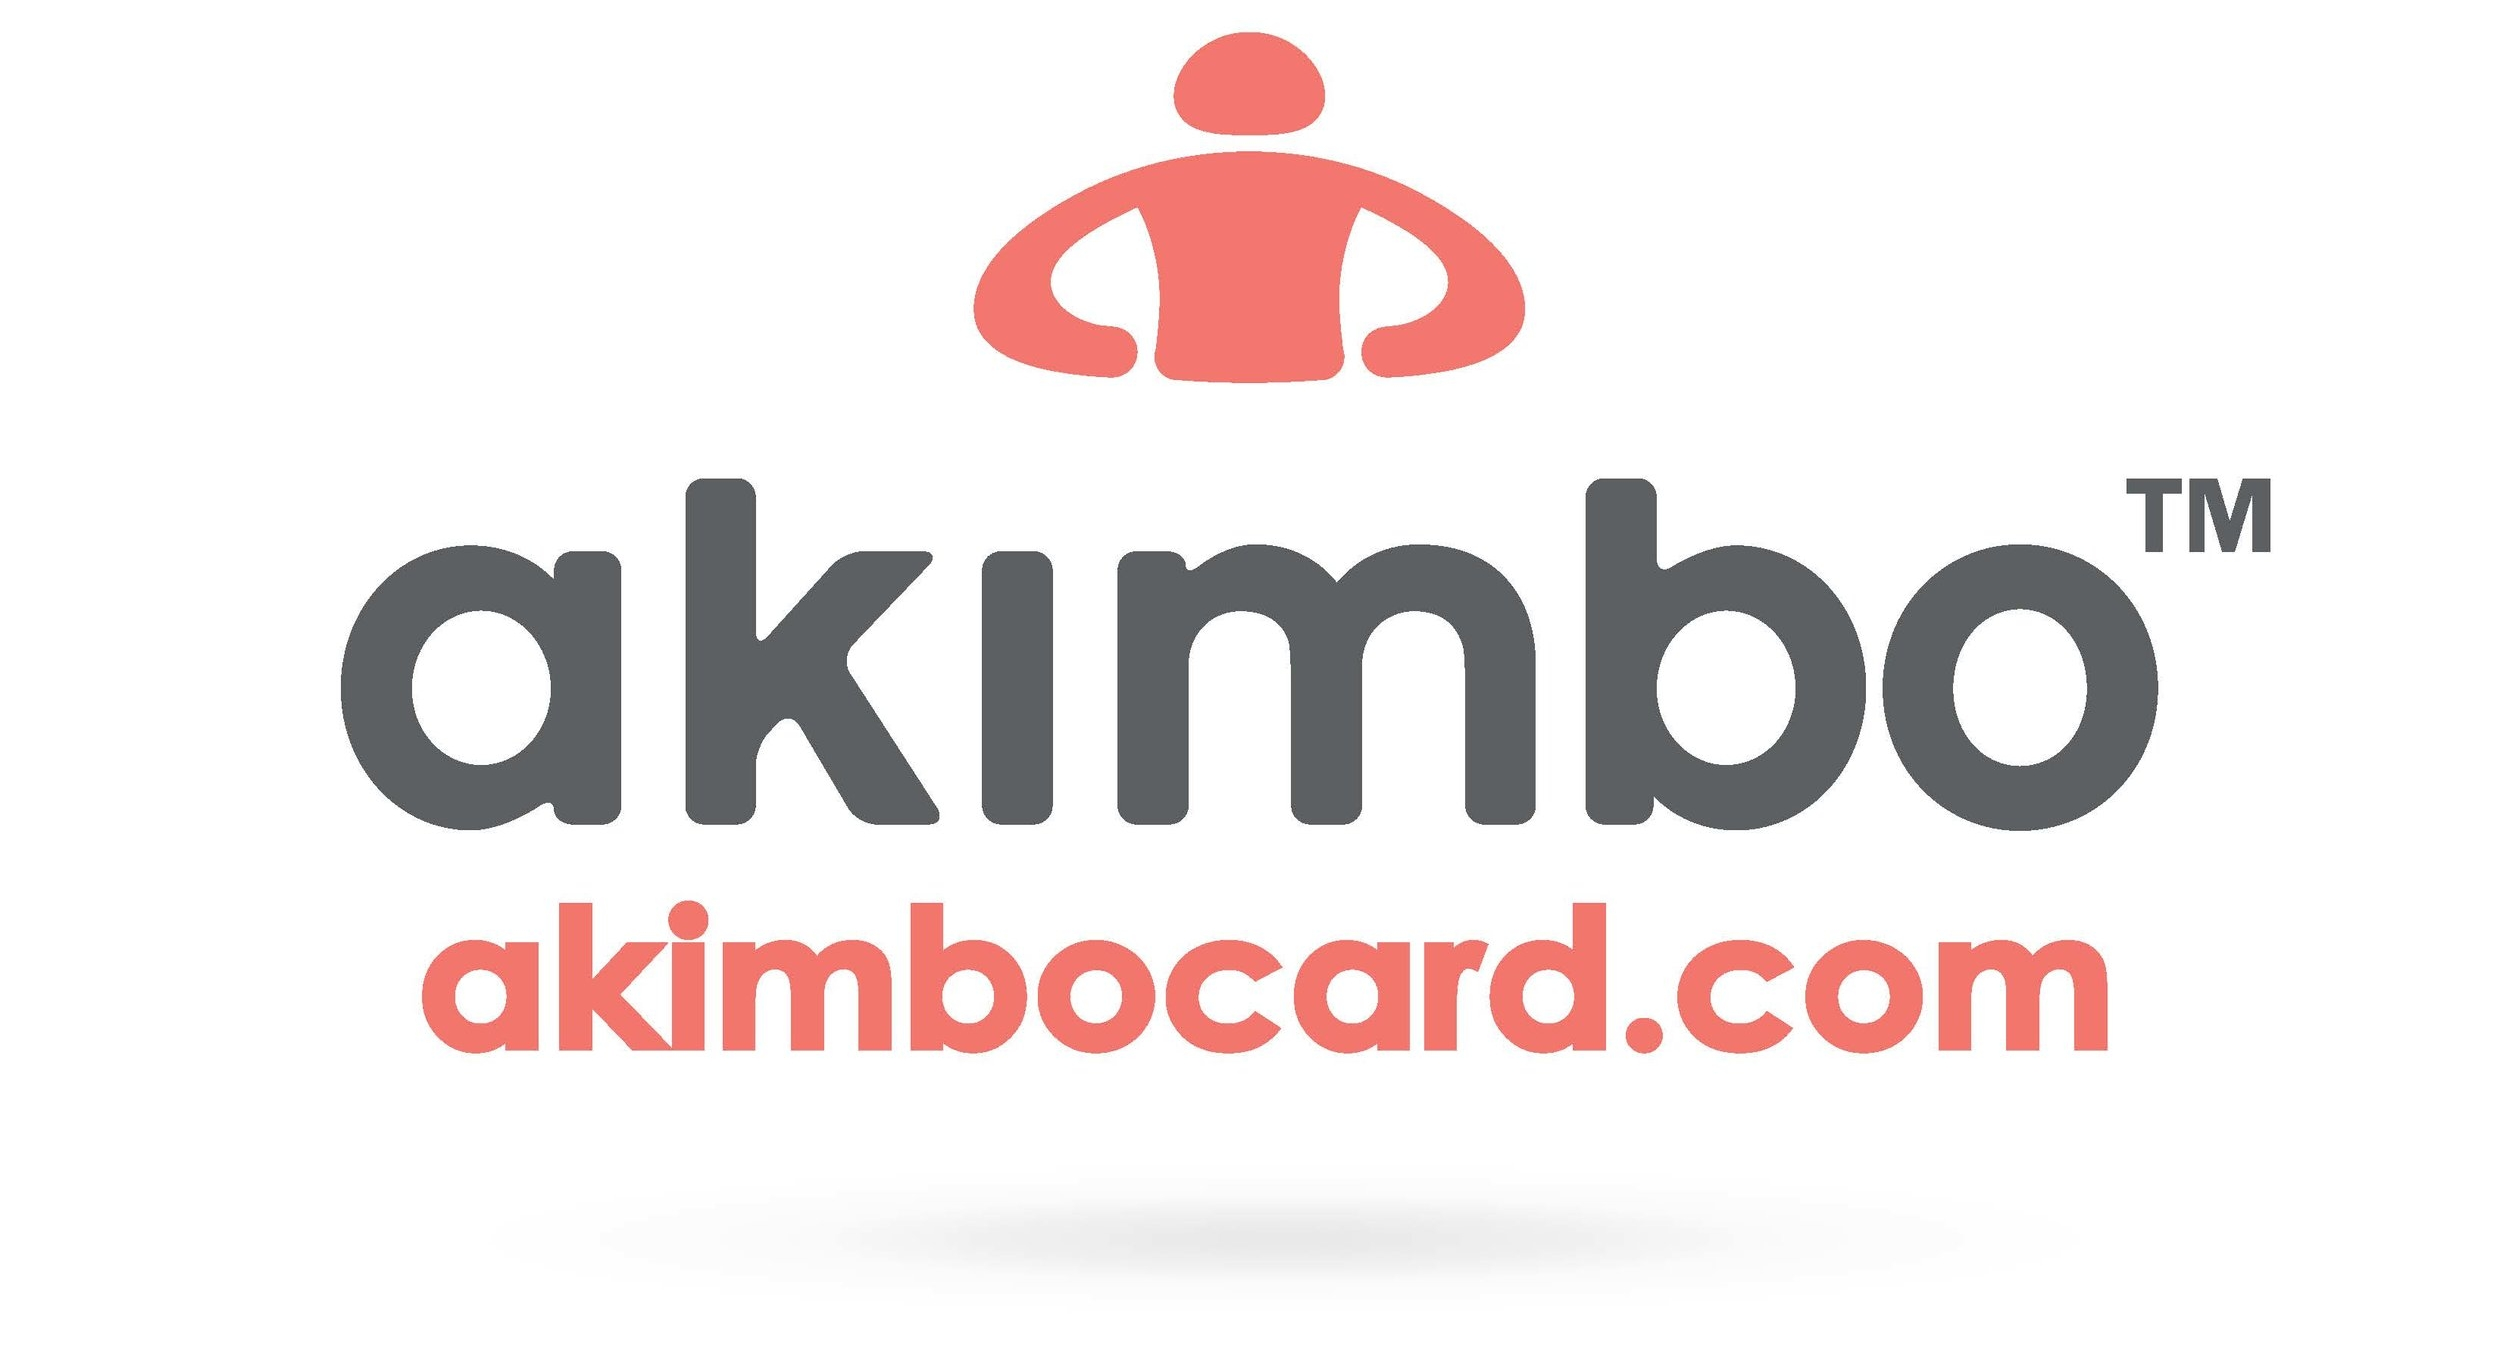 Akimbo_Card_logo-URL.jpg